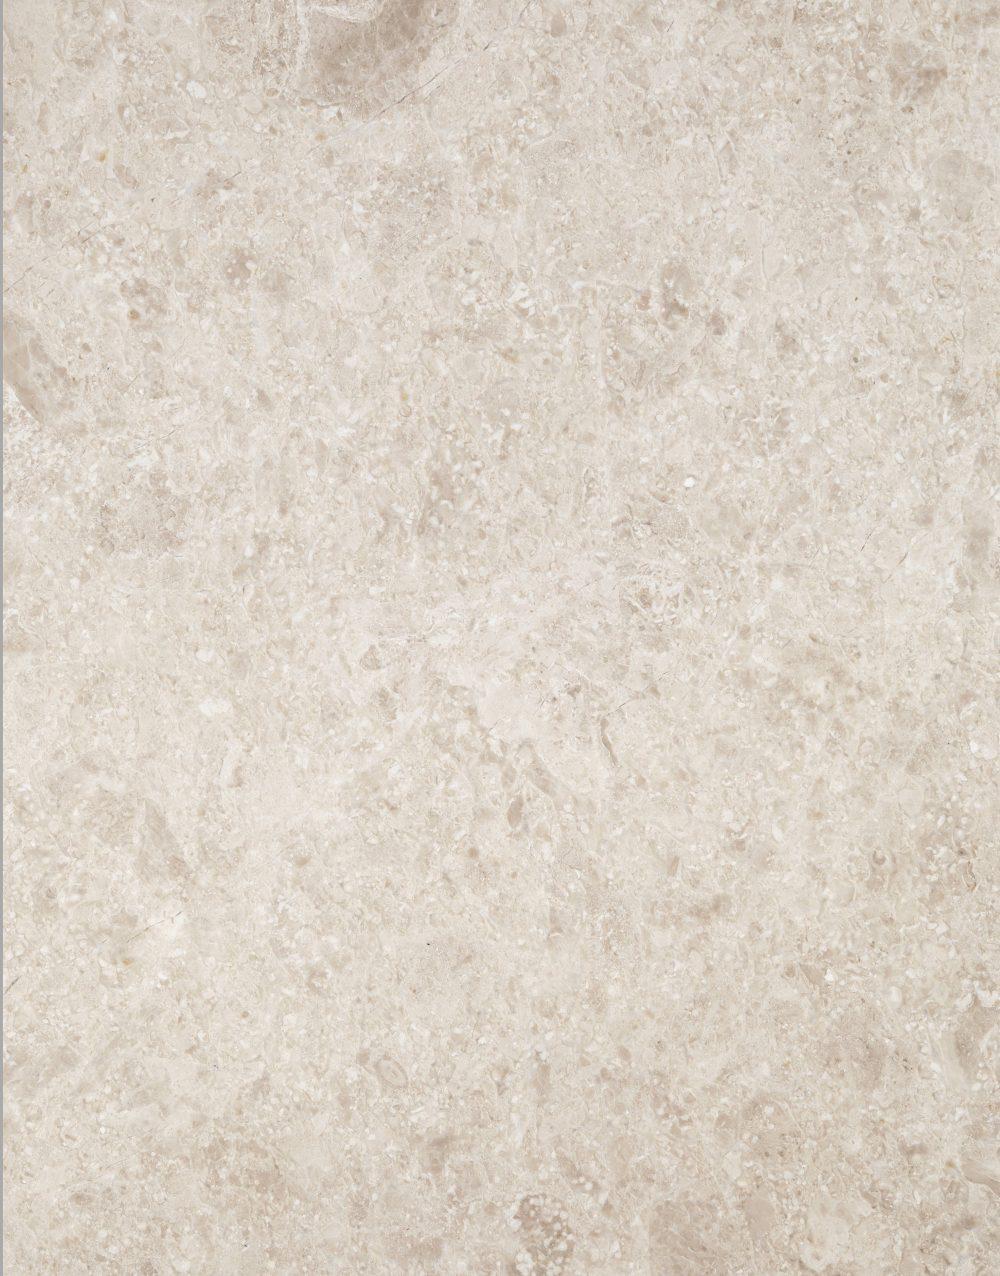 Crema Grigio Marble Honed Surface